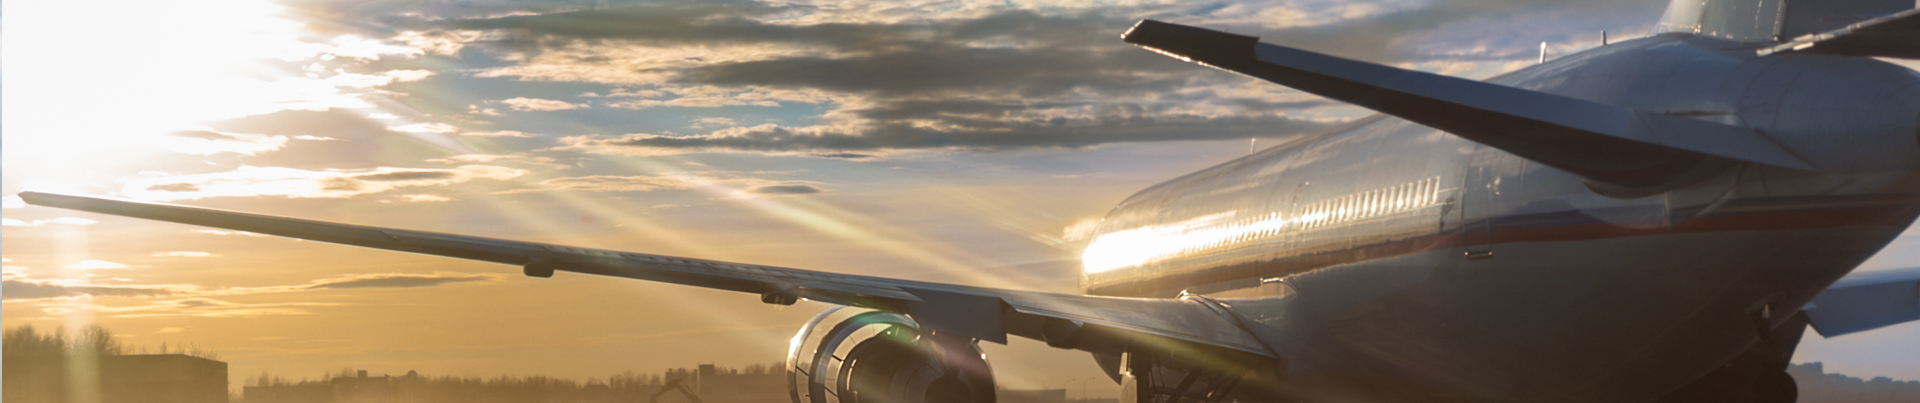 BTX Global Airfreight